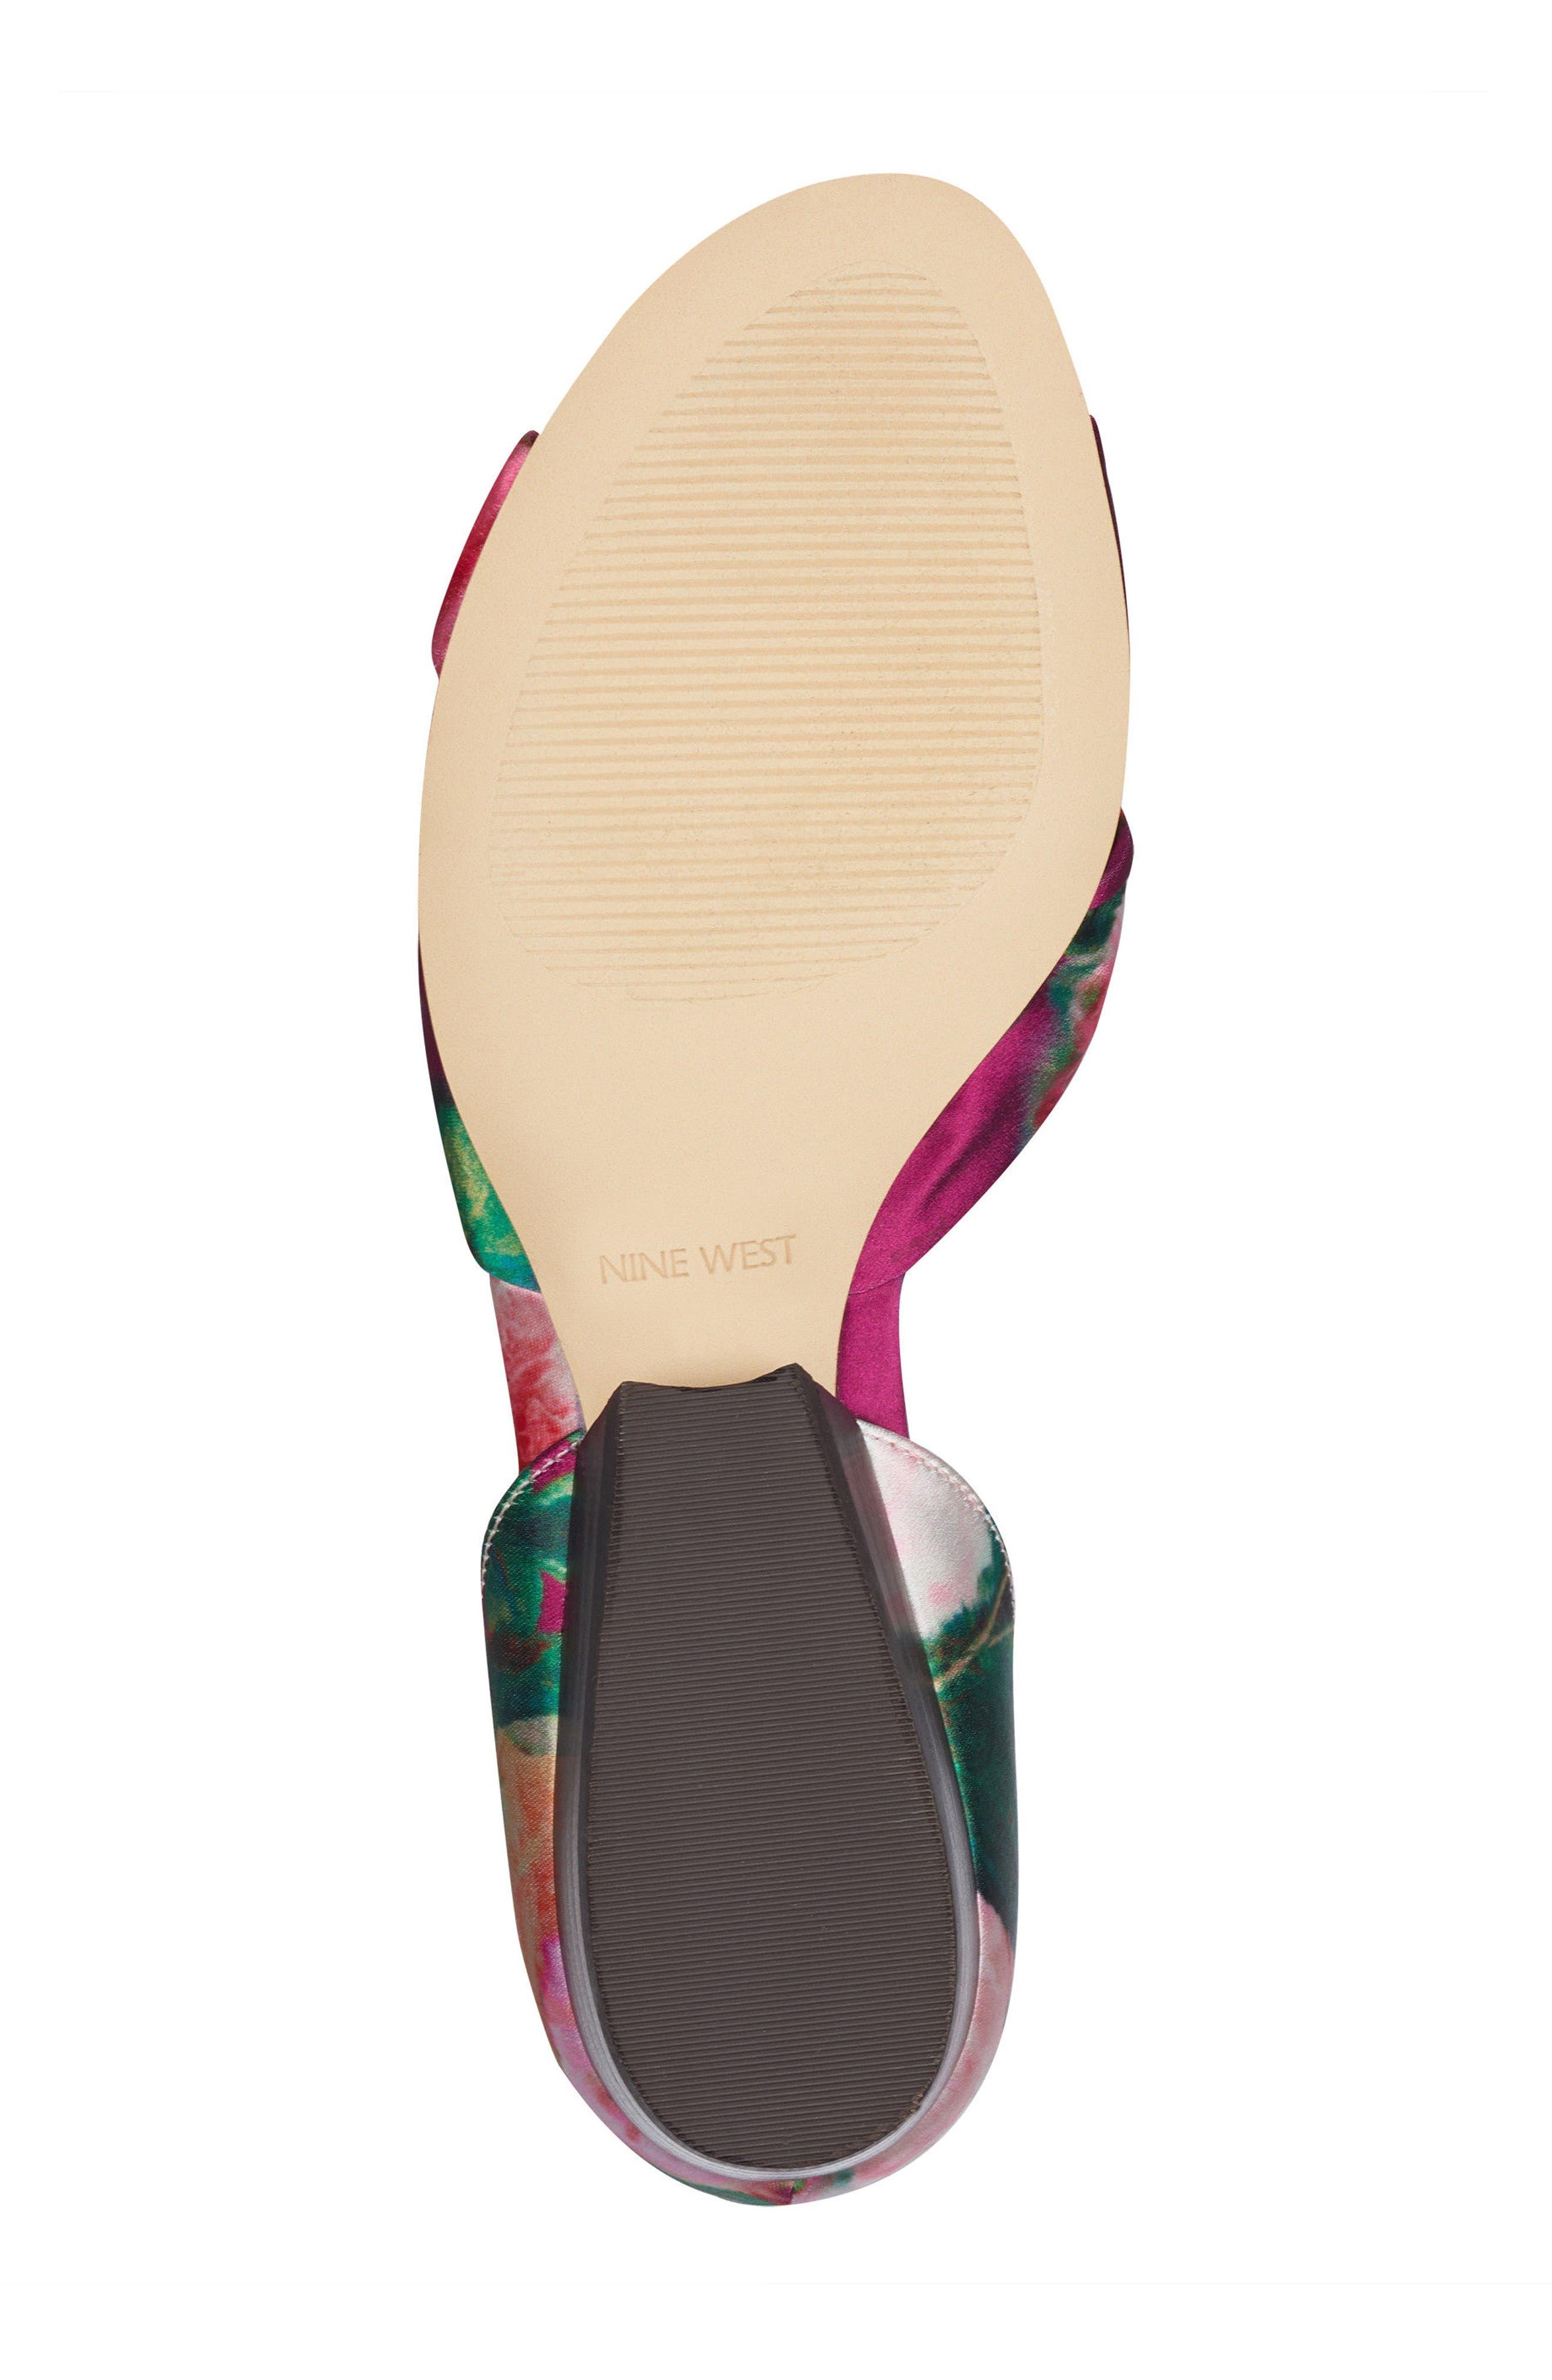 Lumsi Ankle Strap Sandal,                             Alternate thumbnail 6, color,                             Pink Multi Satin